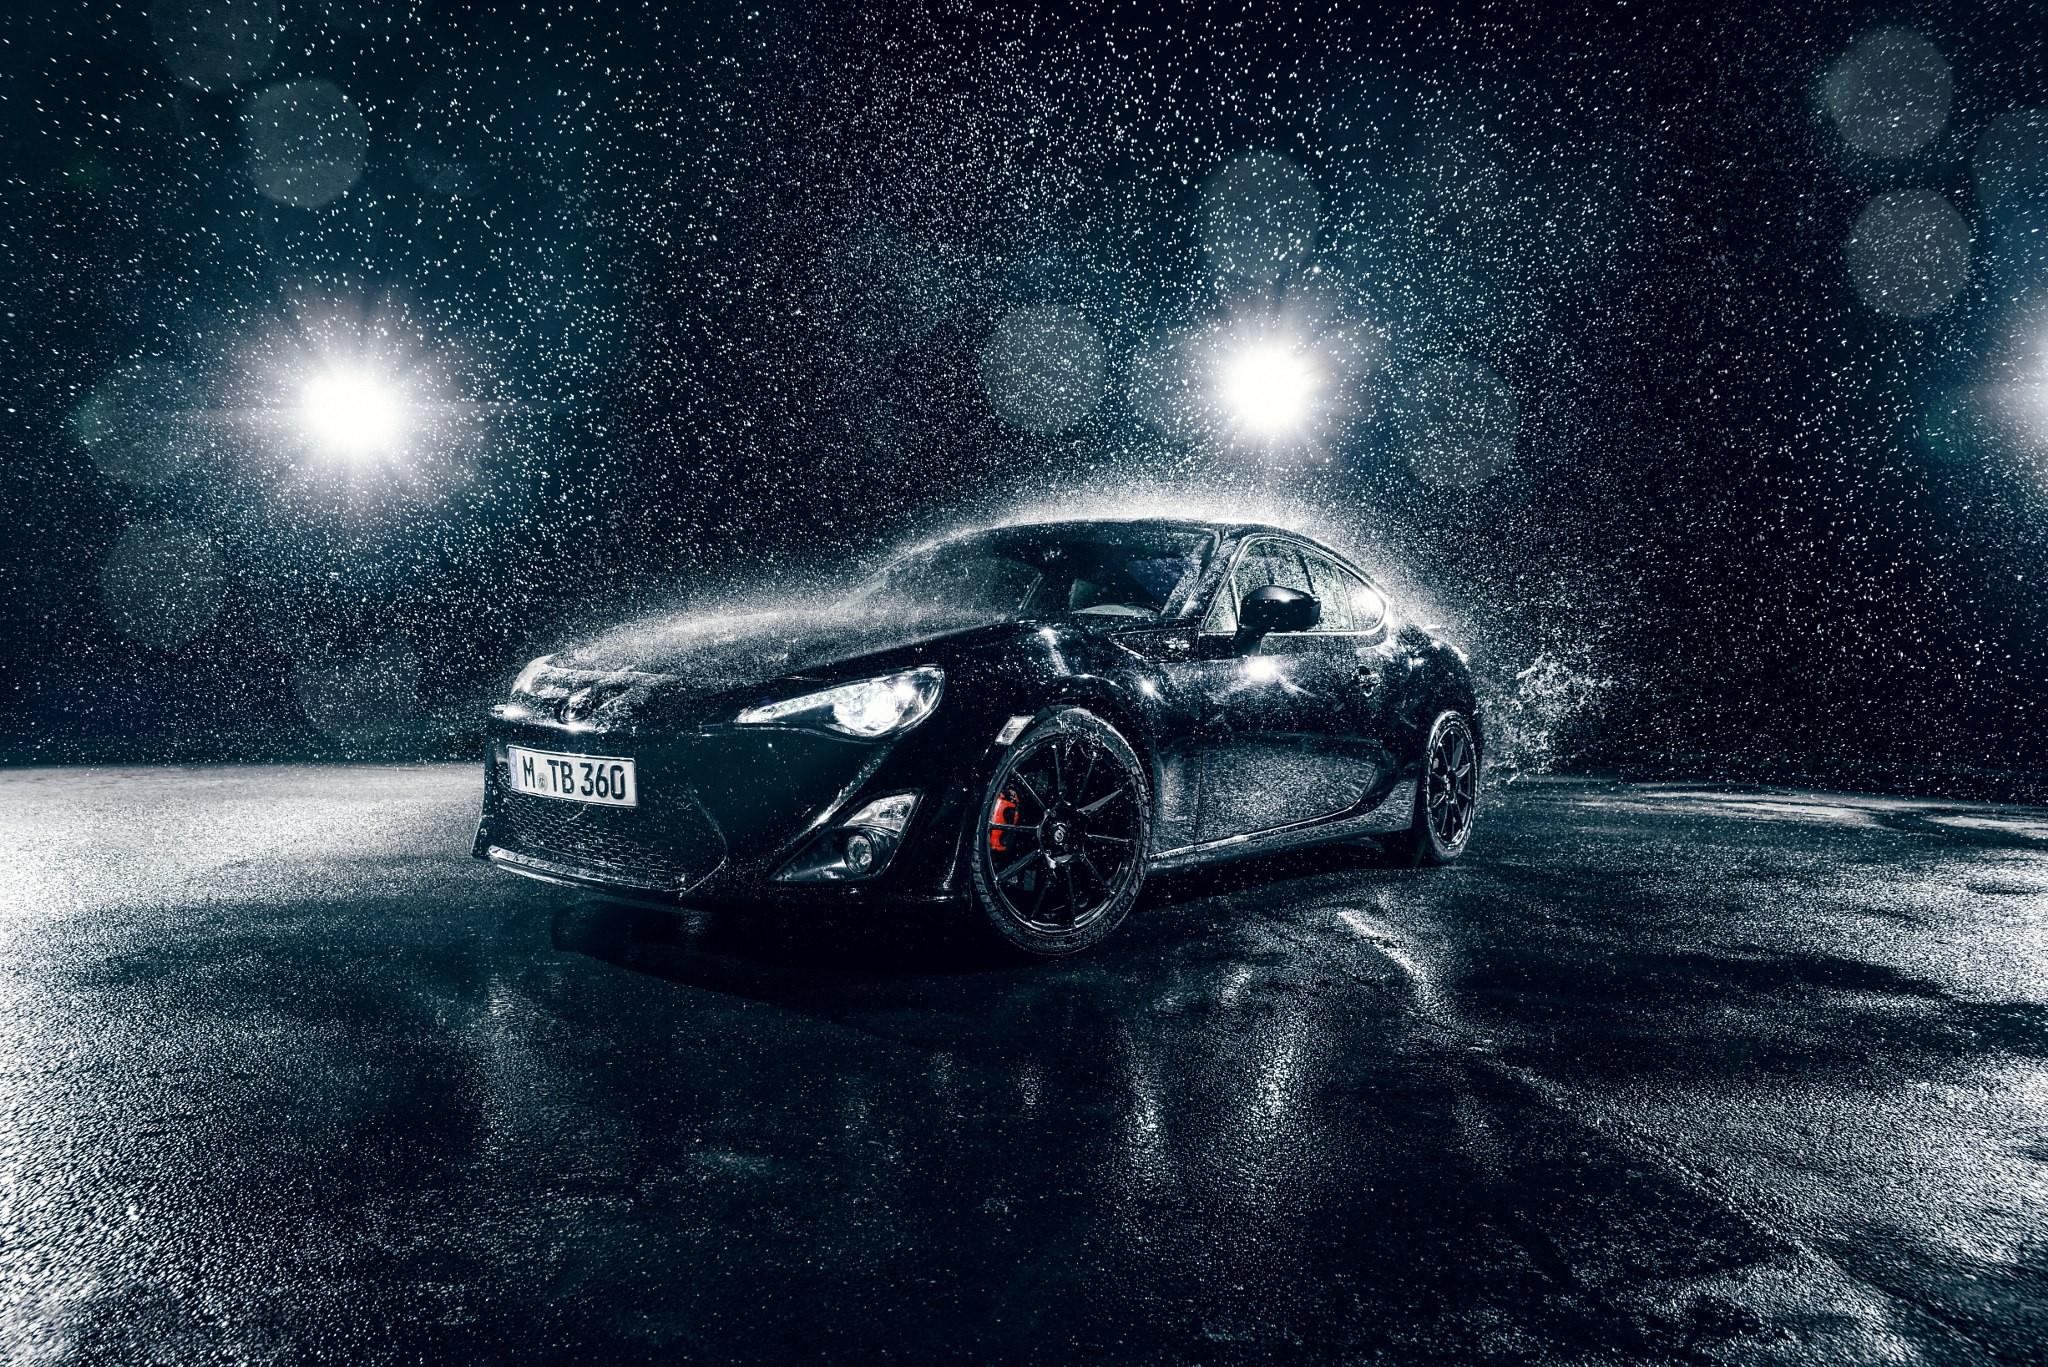 Wallpaper : monochrome, rain, sports car, Toyota 86